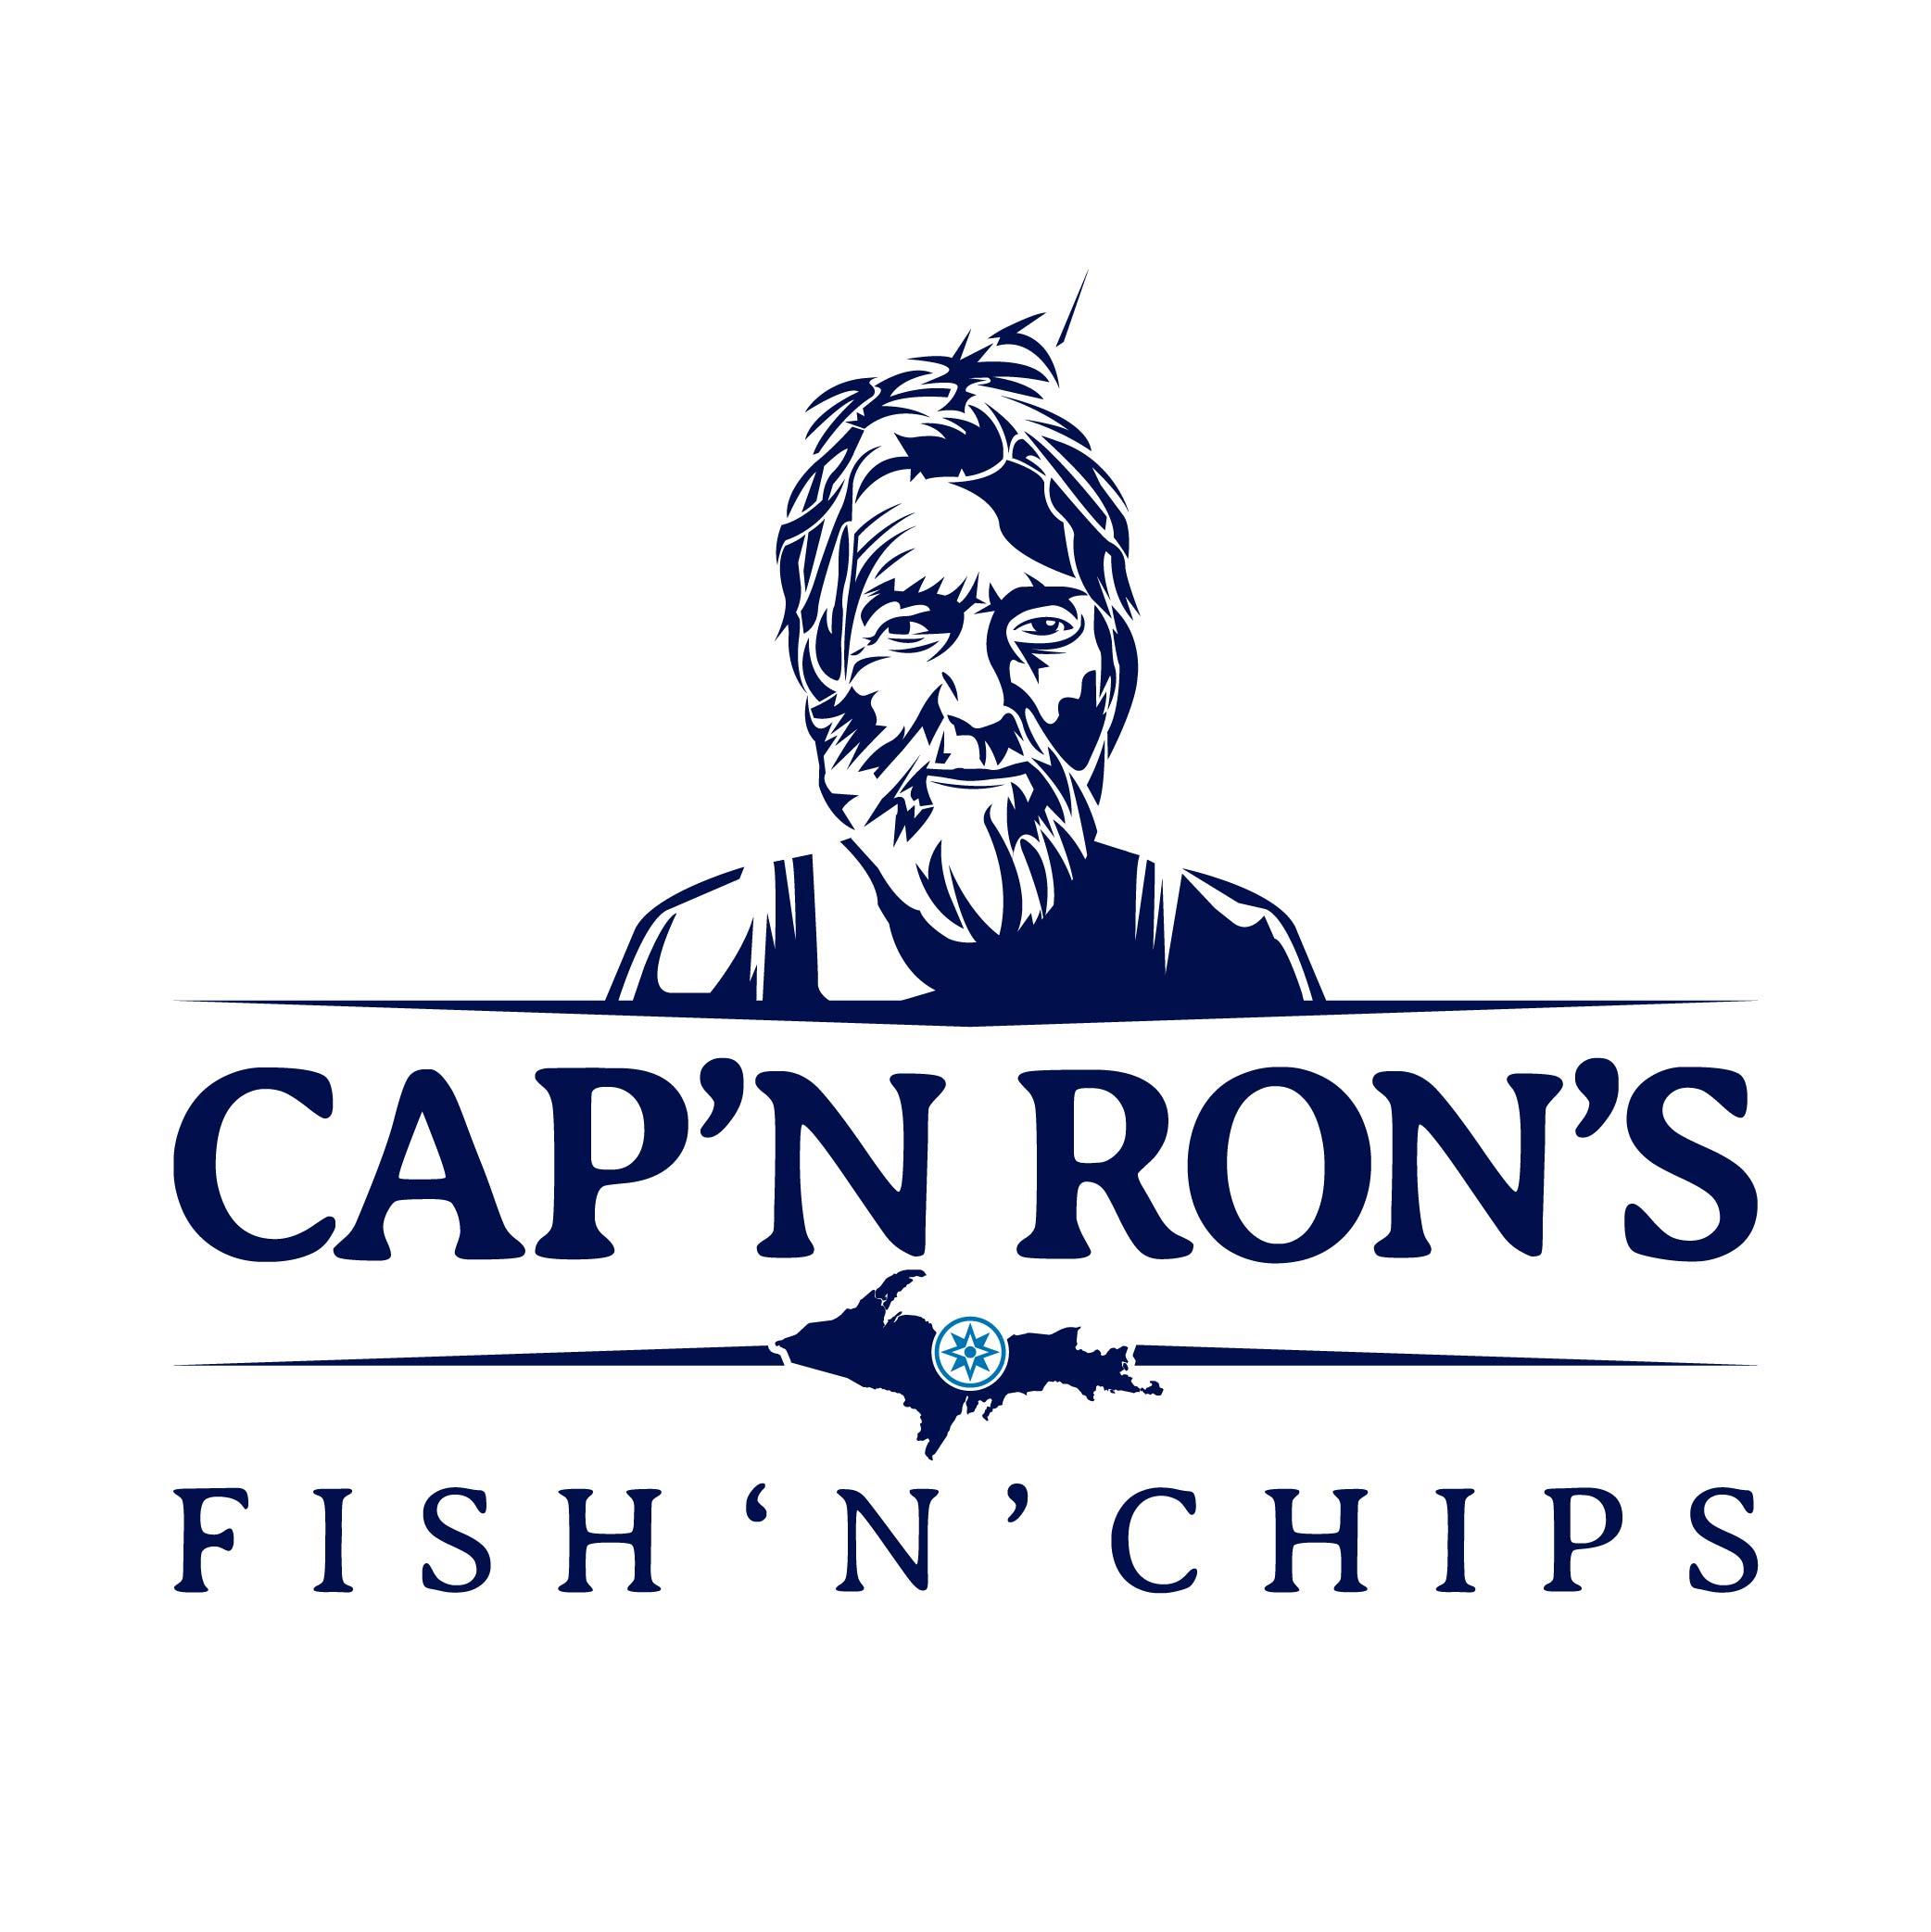 Cap'N Ron's Fish 'N' Chips